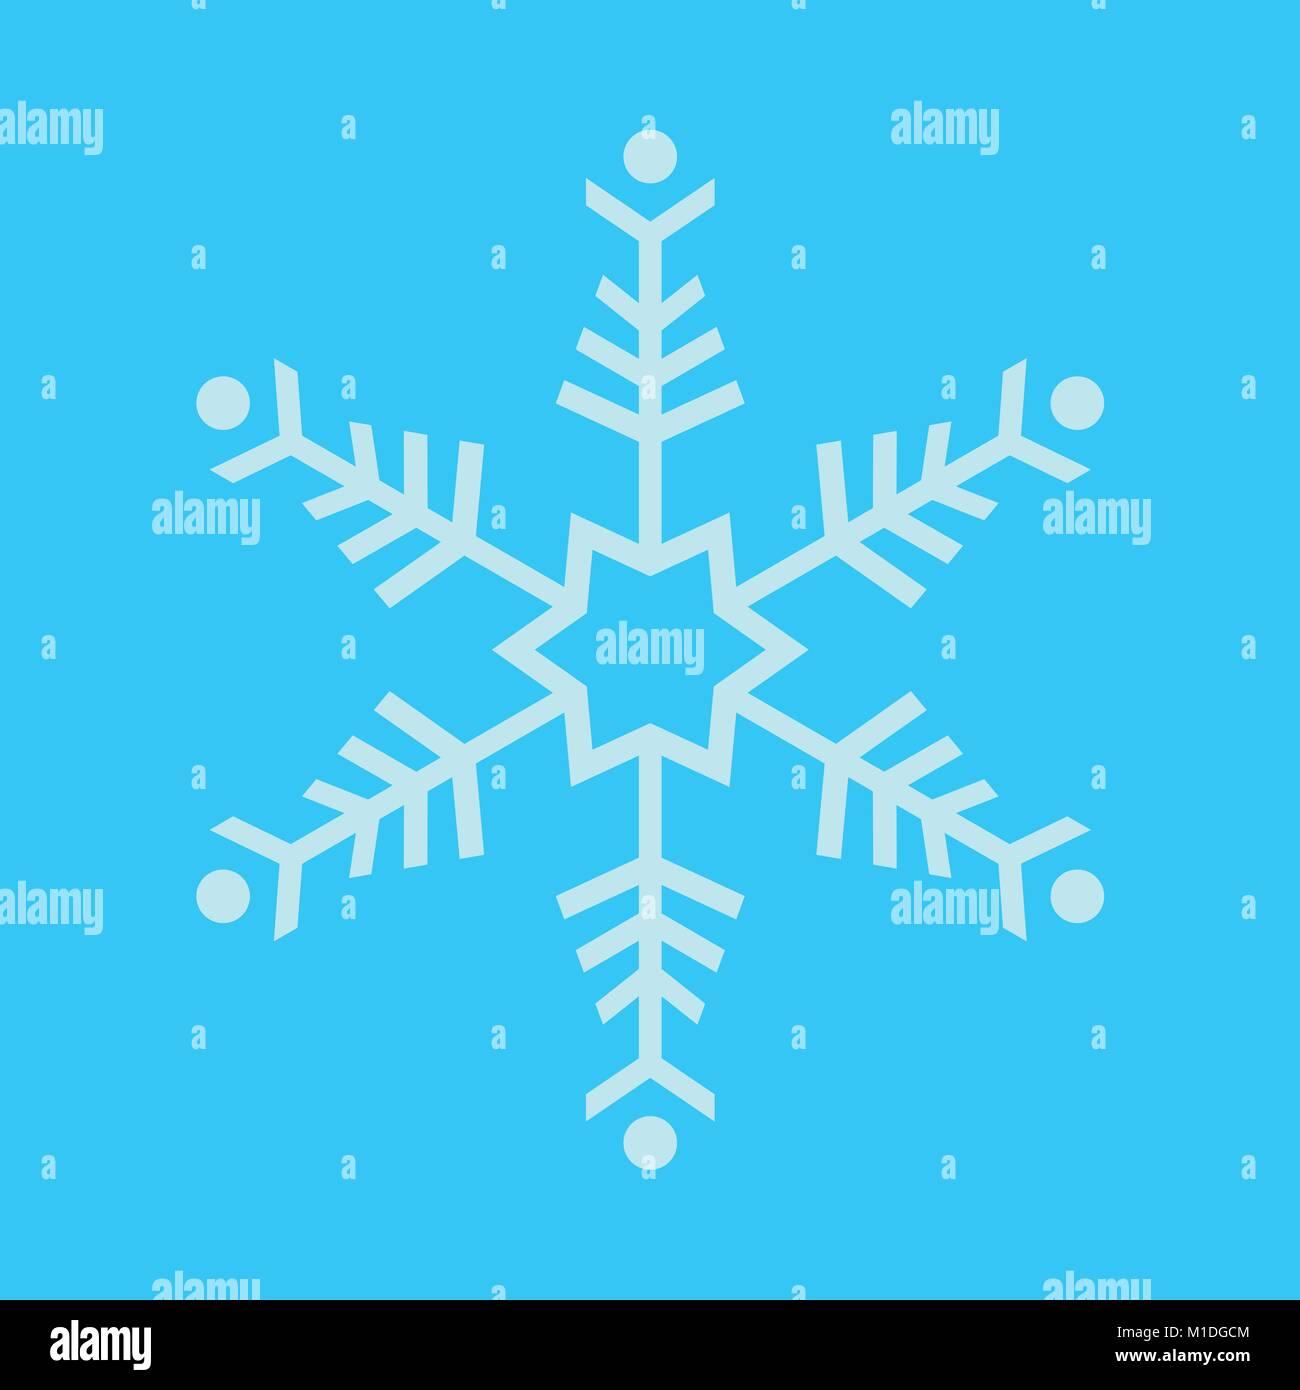 Simple Snowflake Vector Graphic Illustration Sign Symbol Design - Stock Image